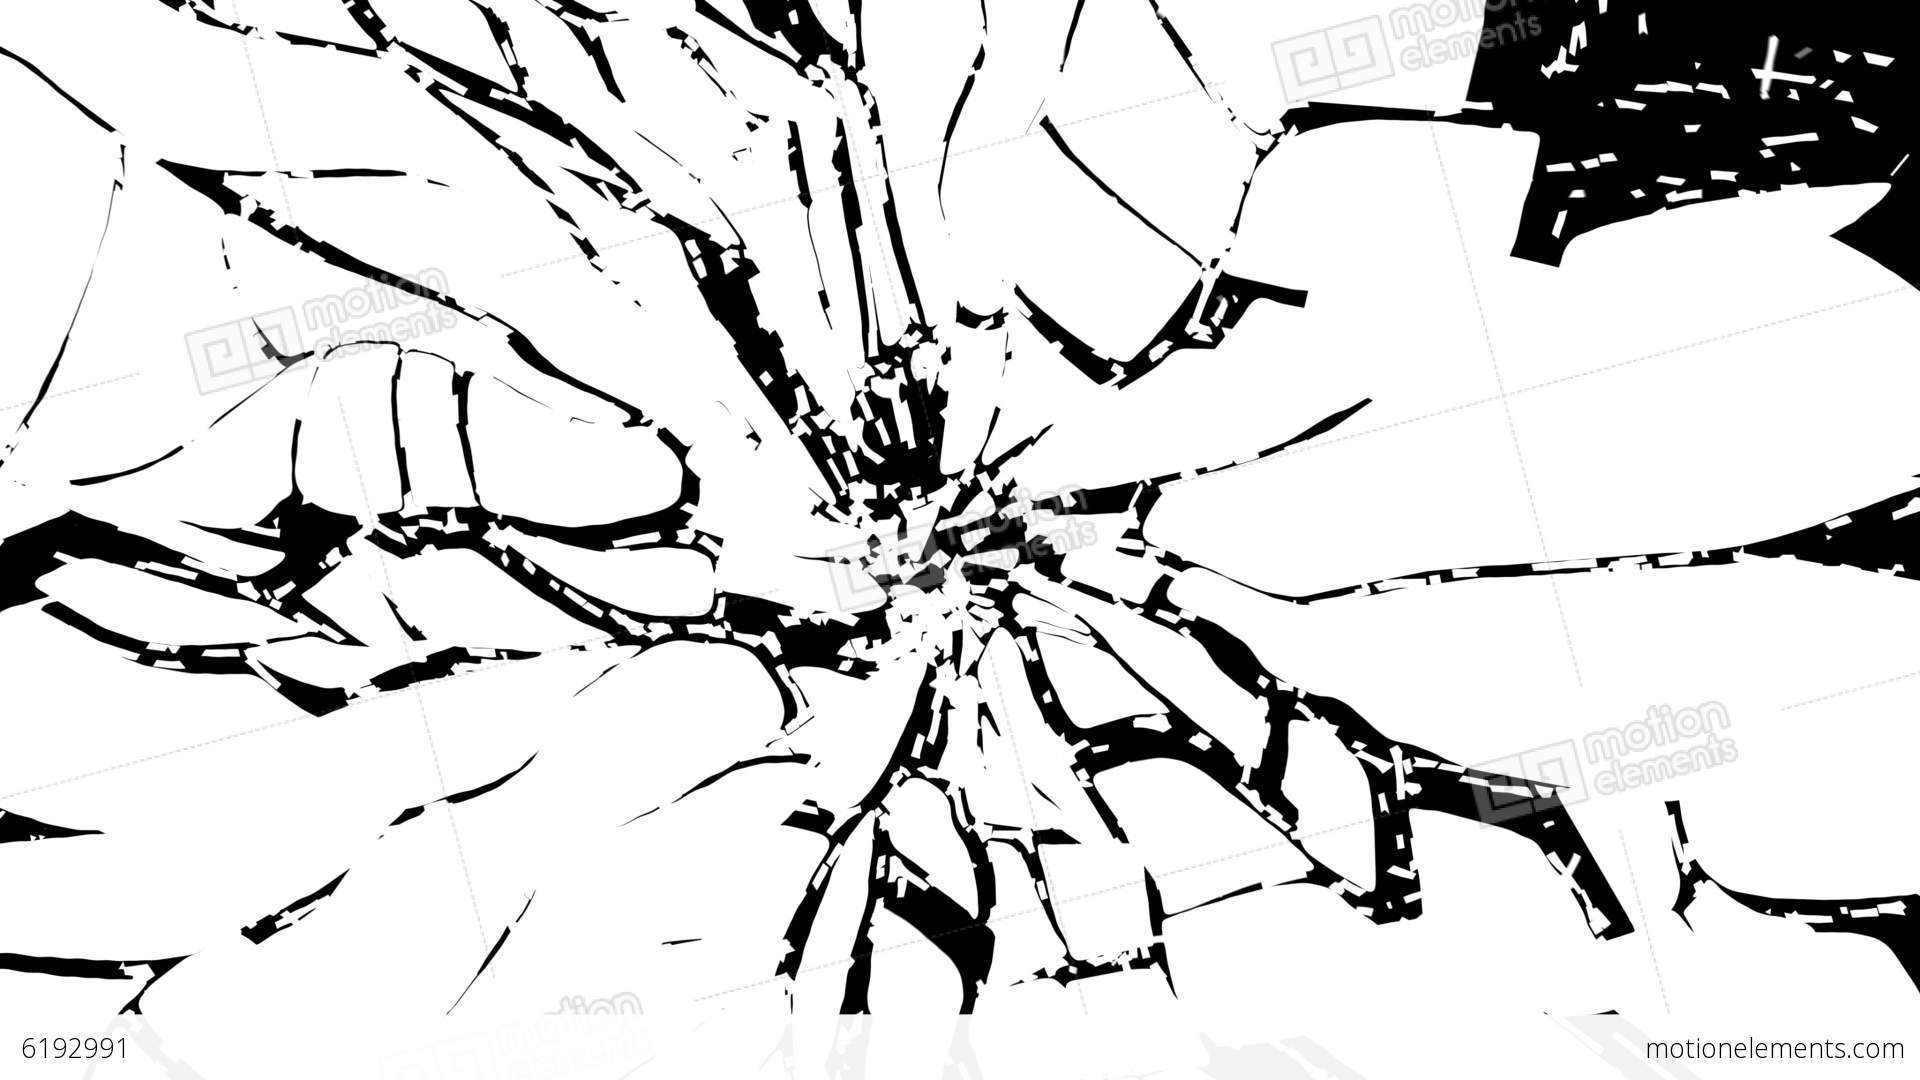 DGN405DNC D likewise 25789 besides Smoke Detector Floor Plan moreover Siberian Husky Gray Wolf Logo Clip Art Husky 879928 also Fire Clipart Black And White. on smoke fire